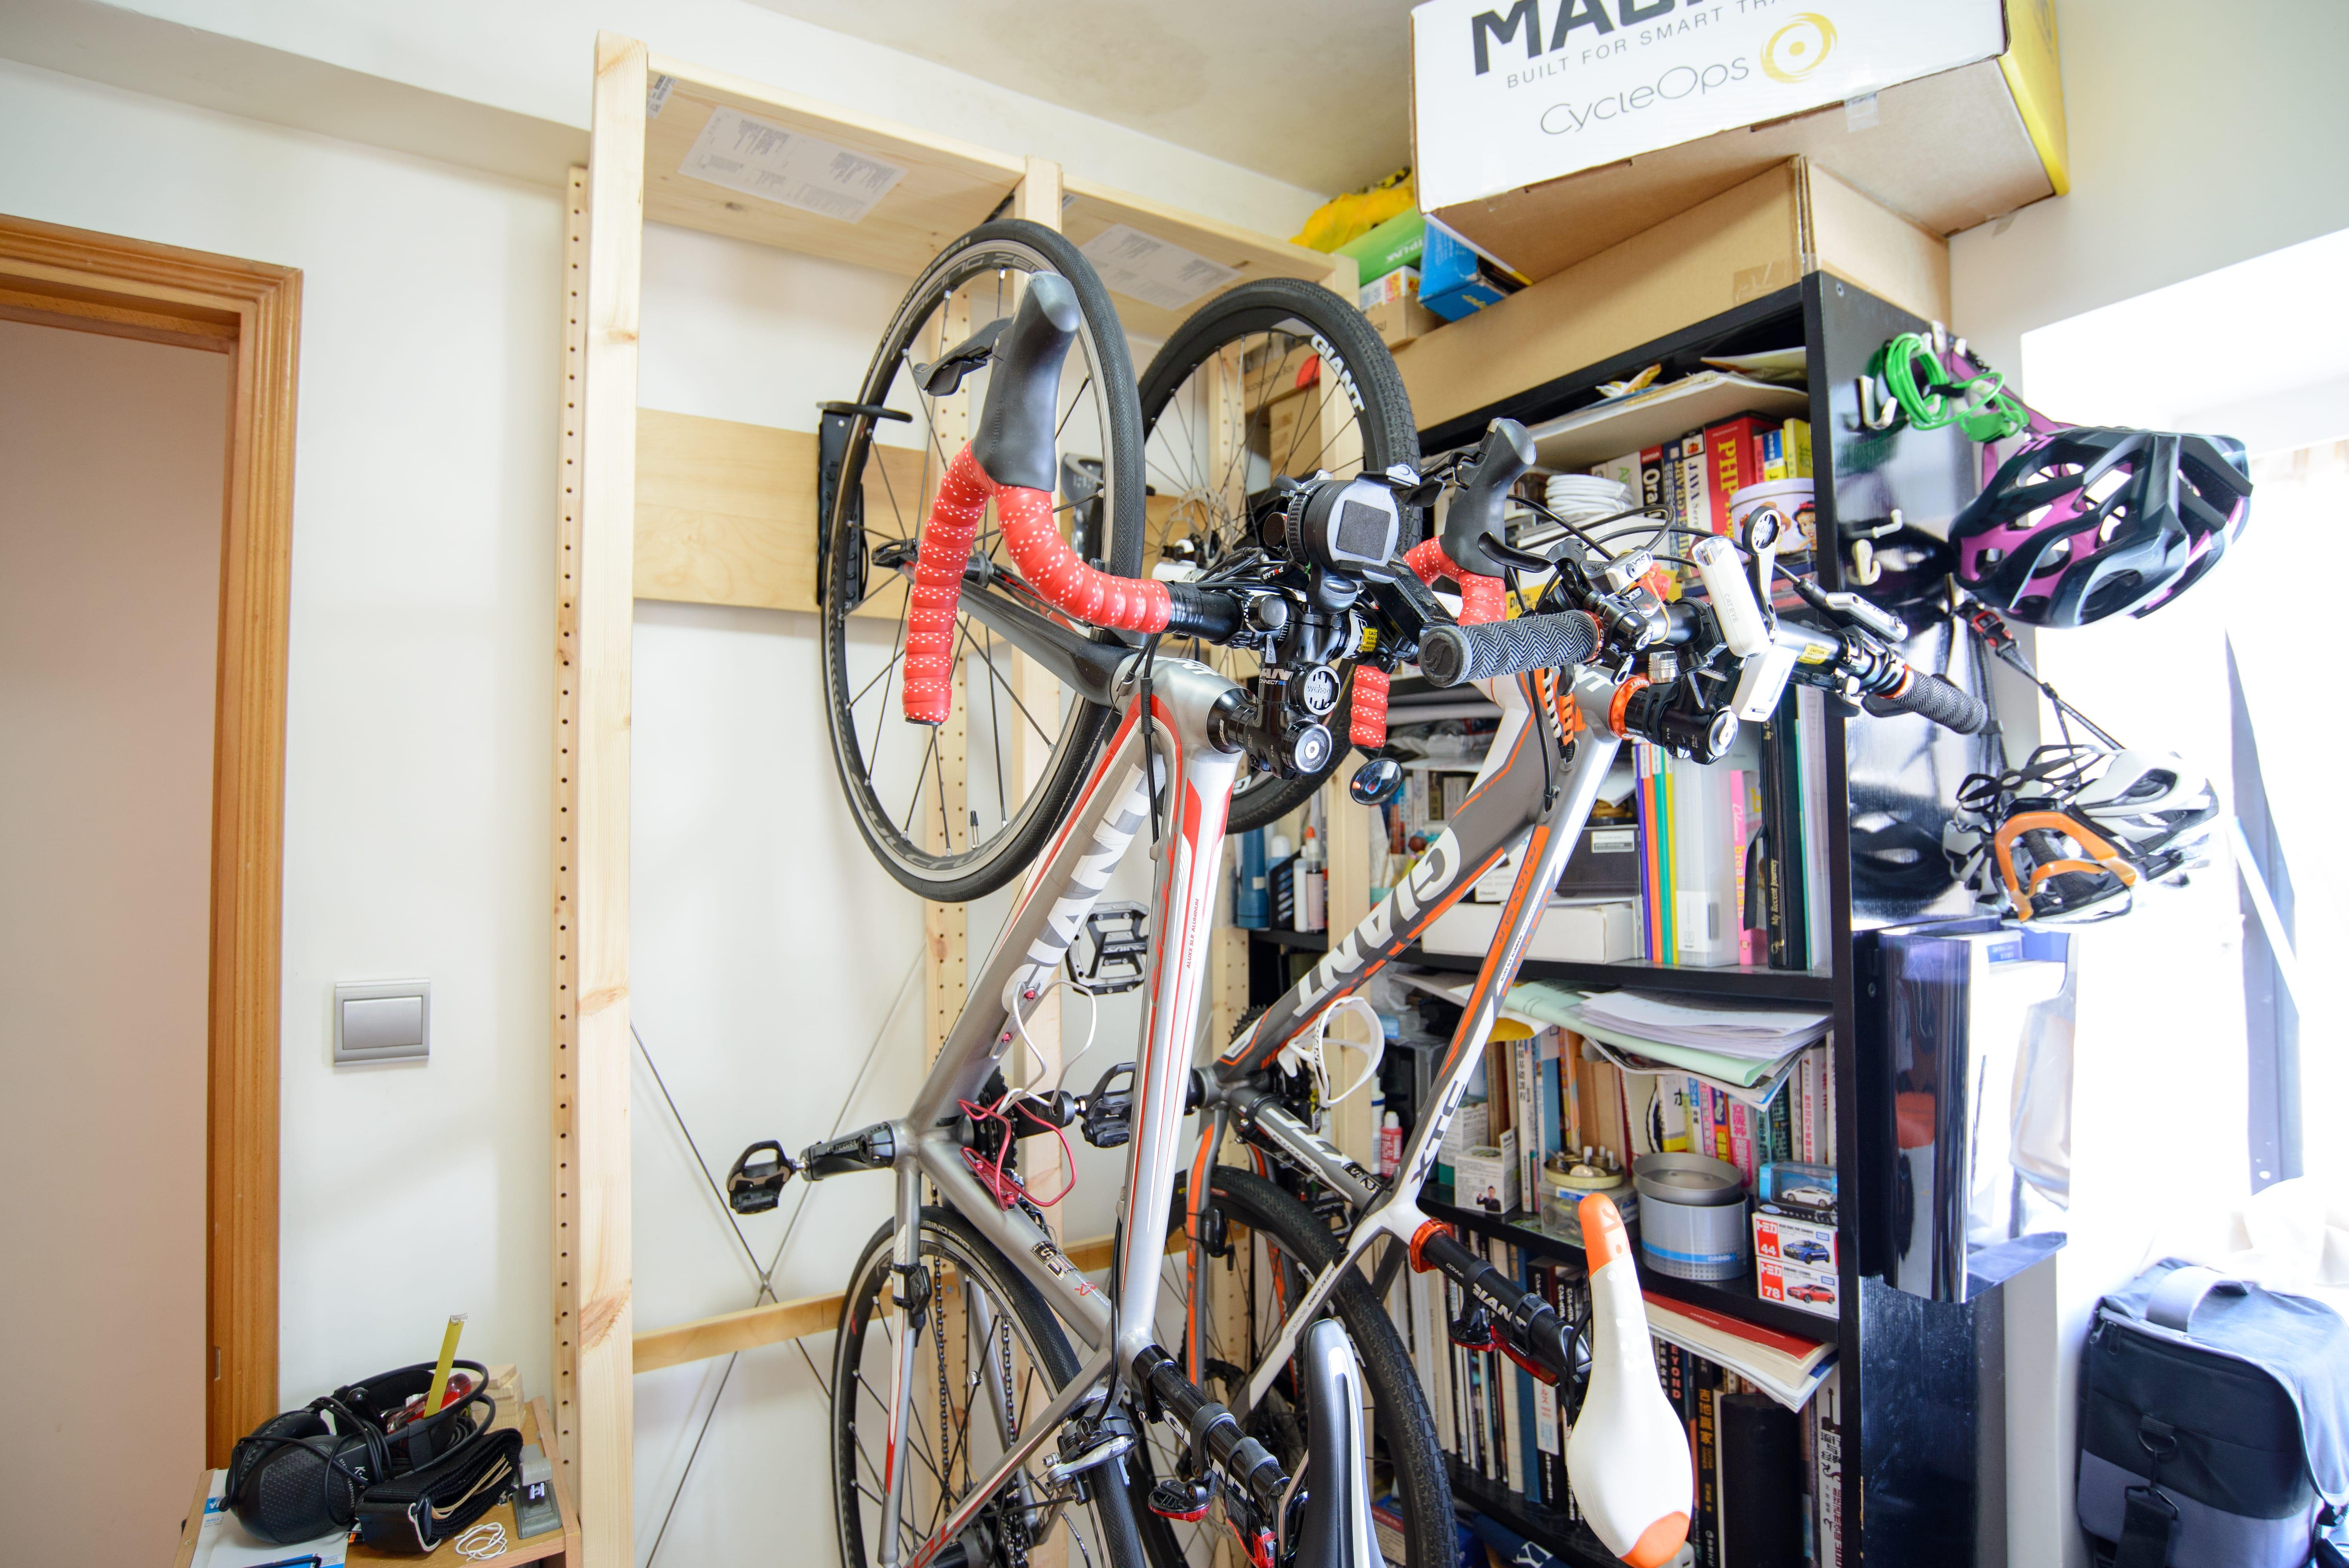 DIY Bike Rack with both Road Bike & MTB mounted